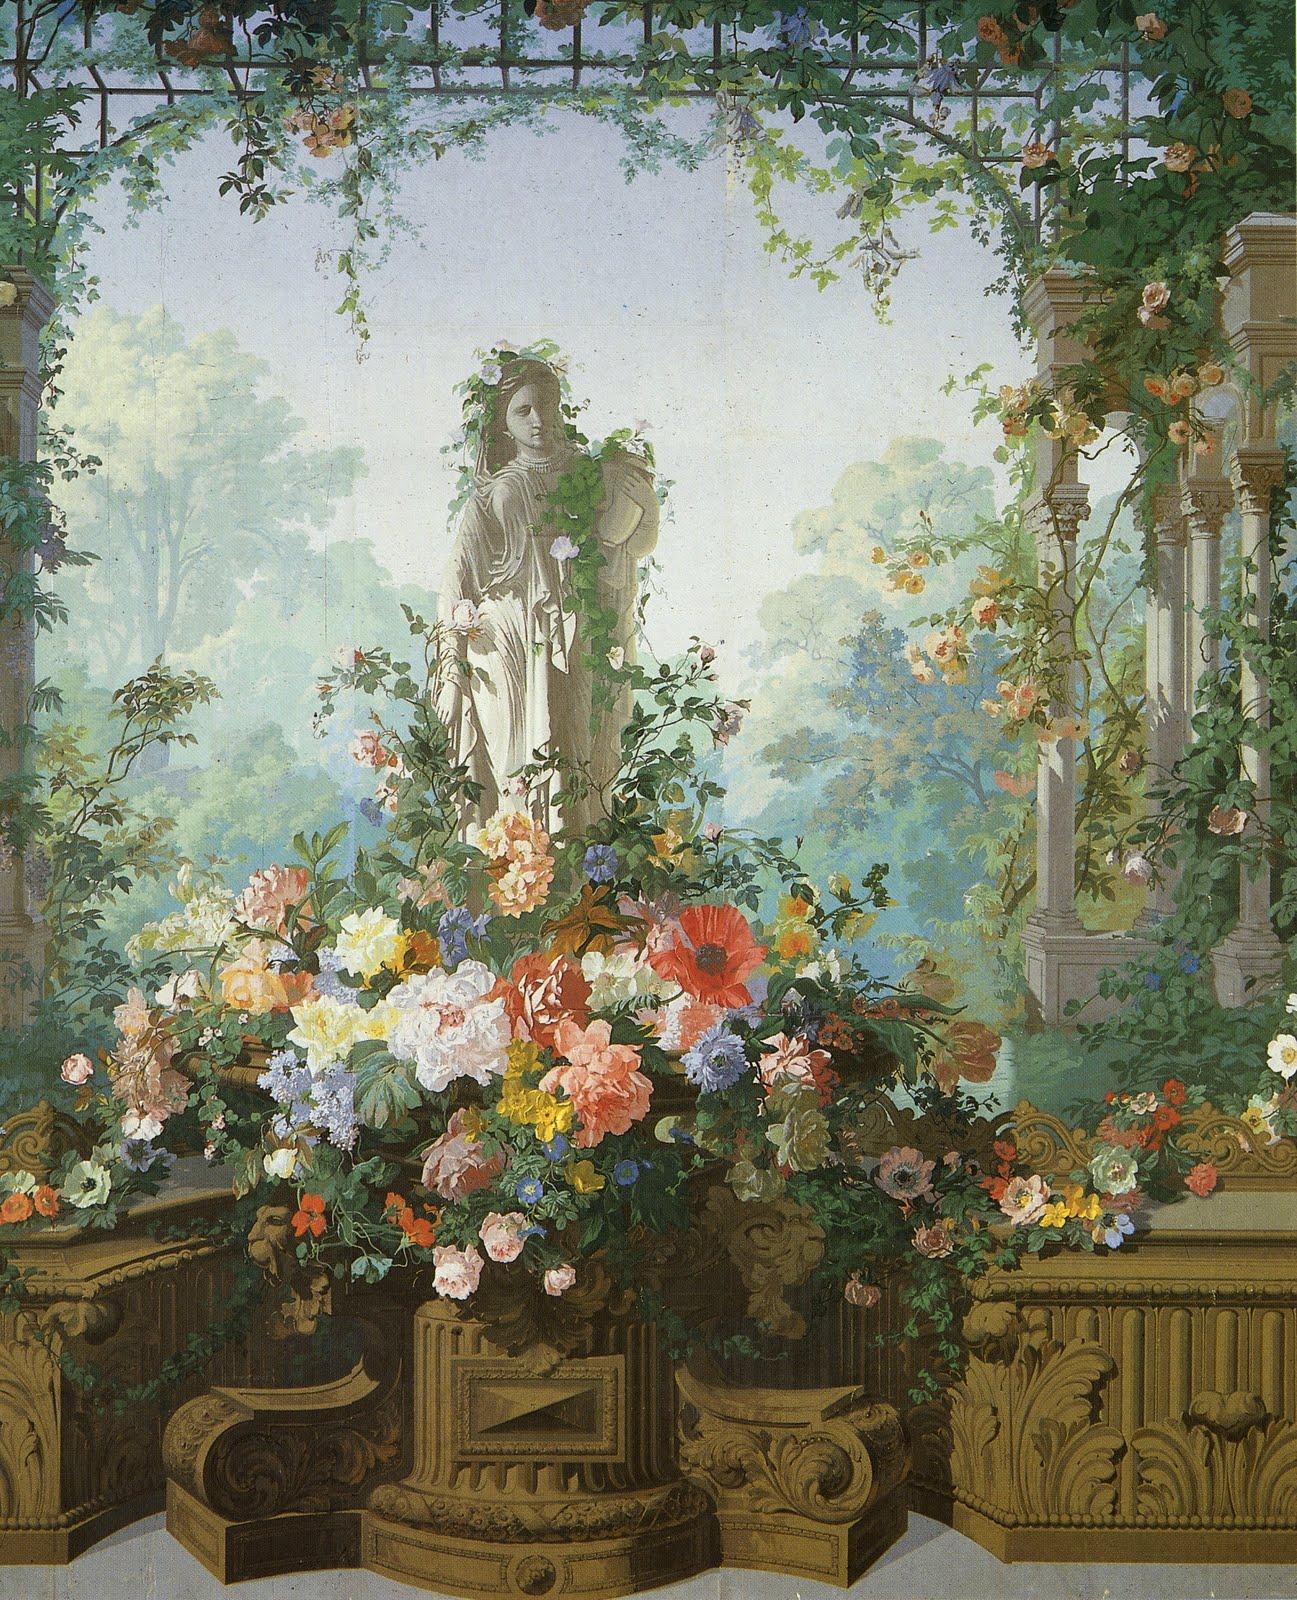 cityzenart: 19th Century French Scenic Wallpapers